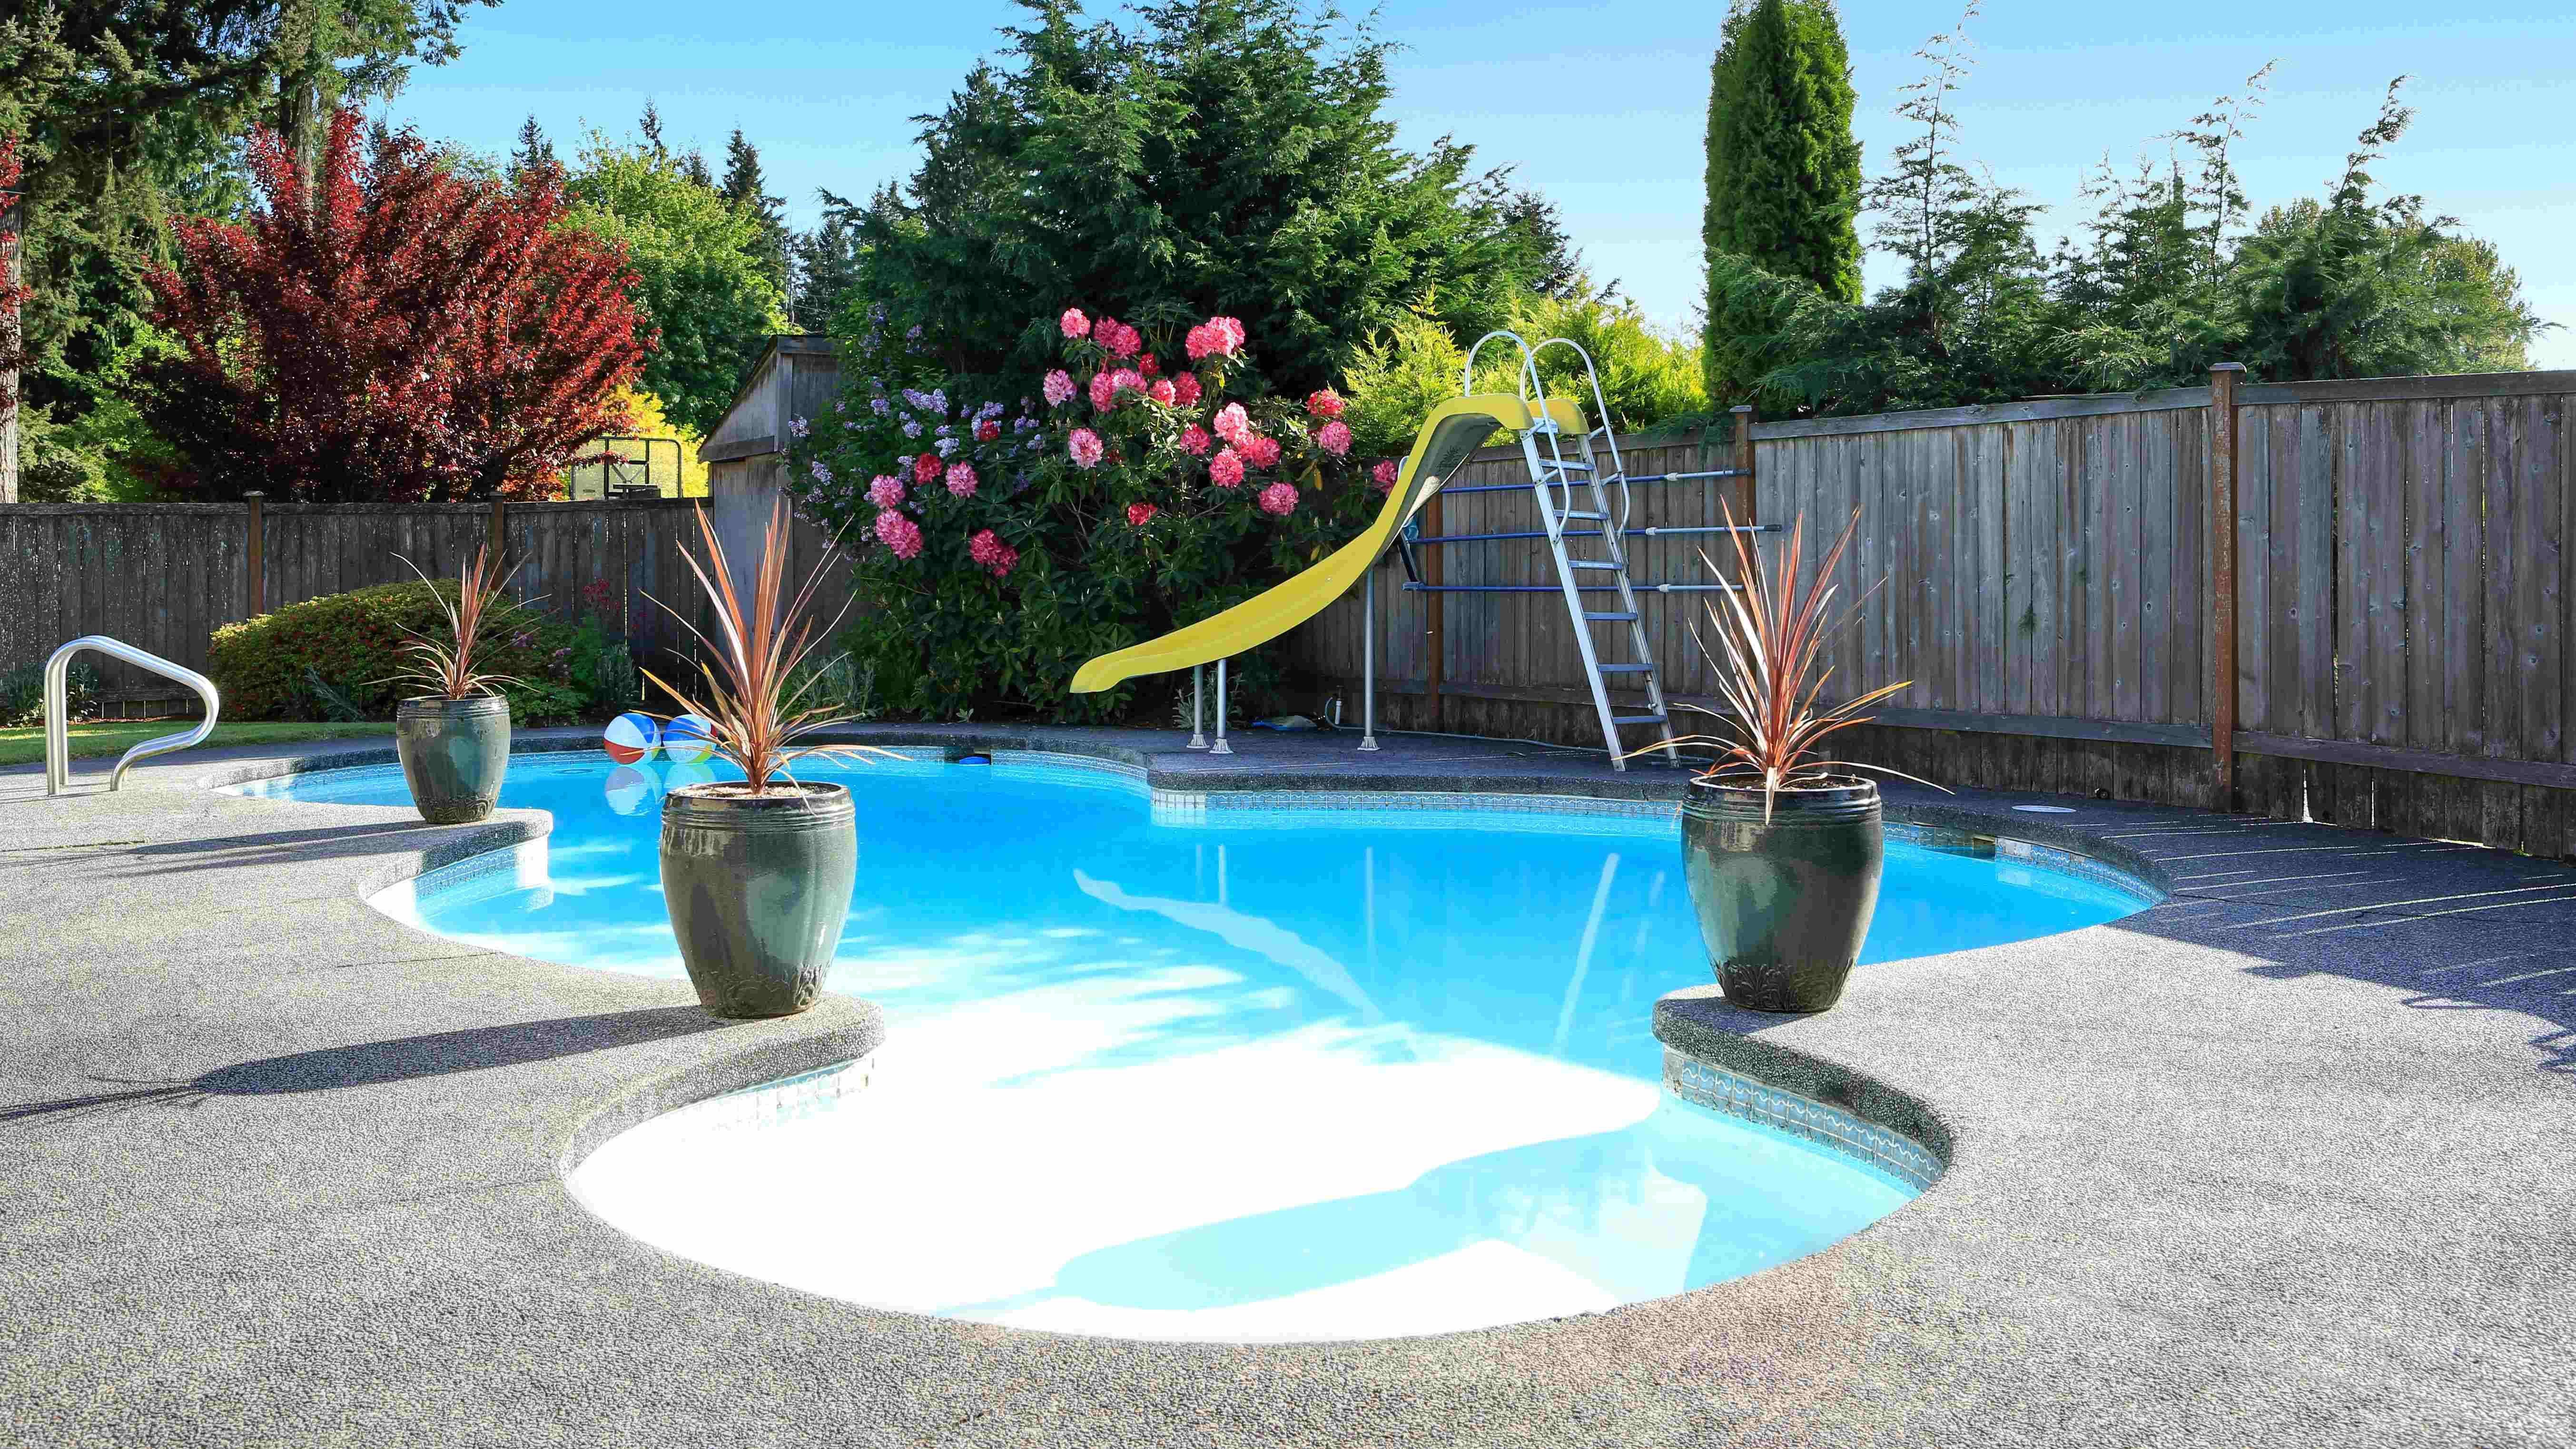 Swimming pool buying guide